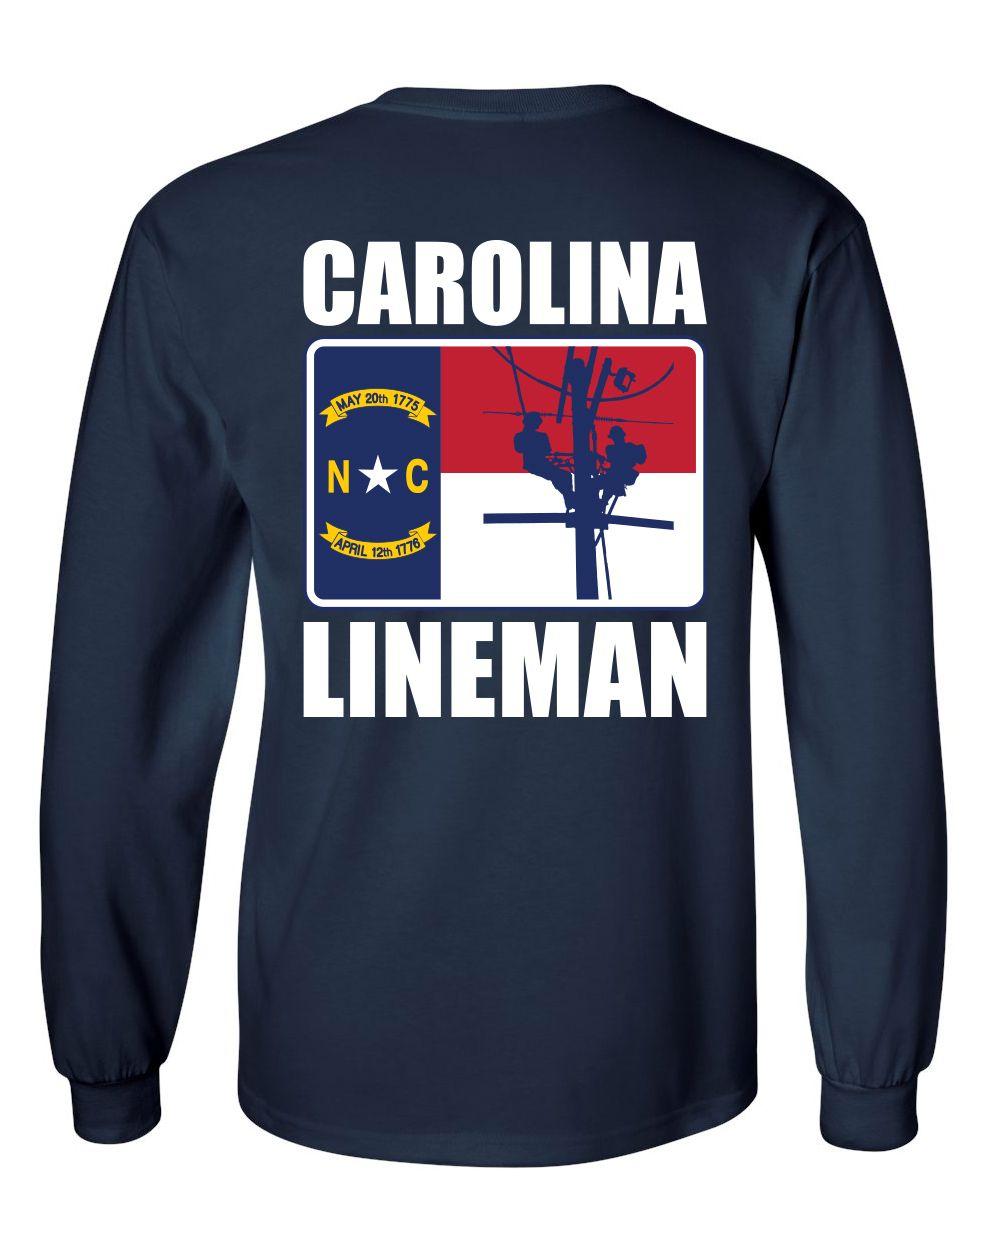 Carolina Lineman Shirt State Of North Carolina Flag With Power